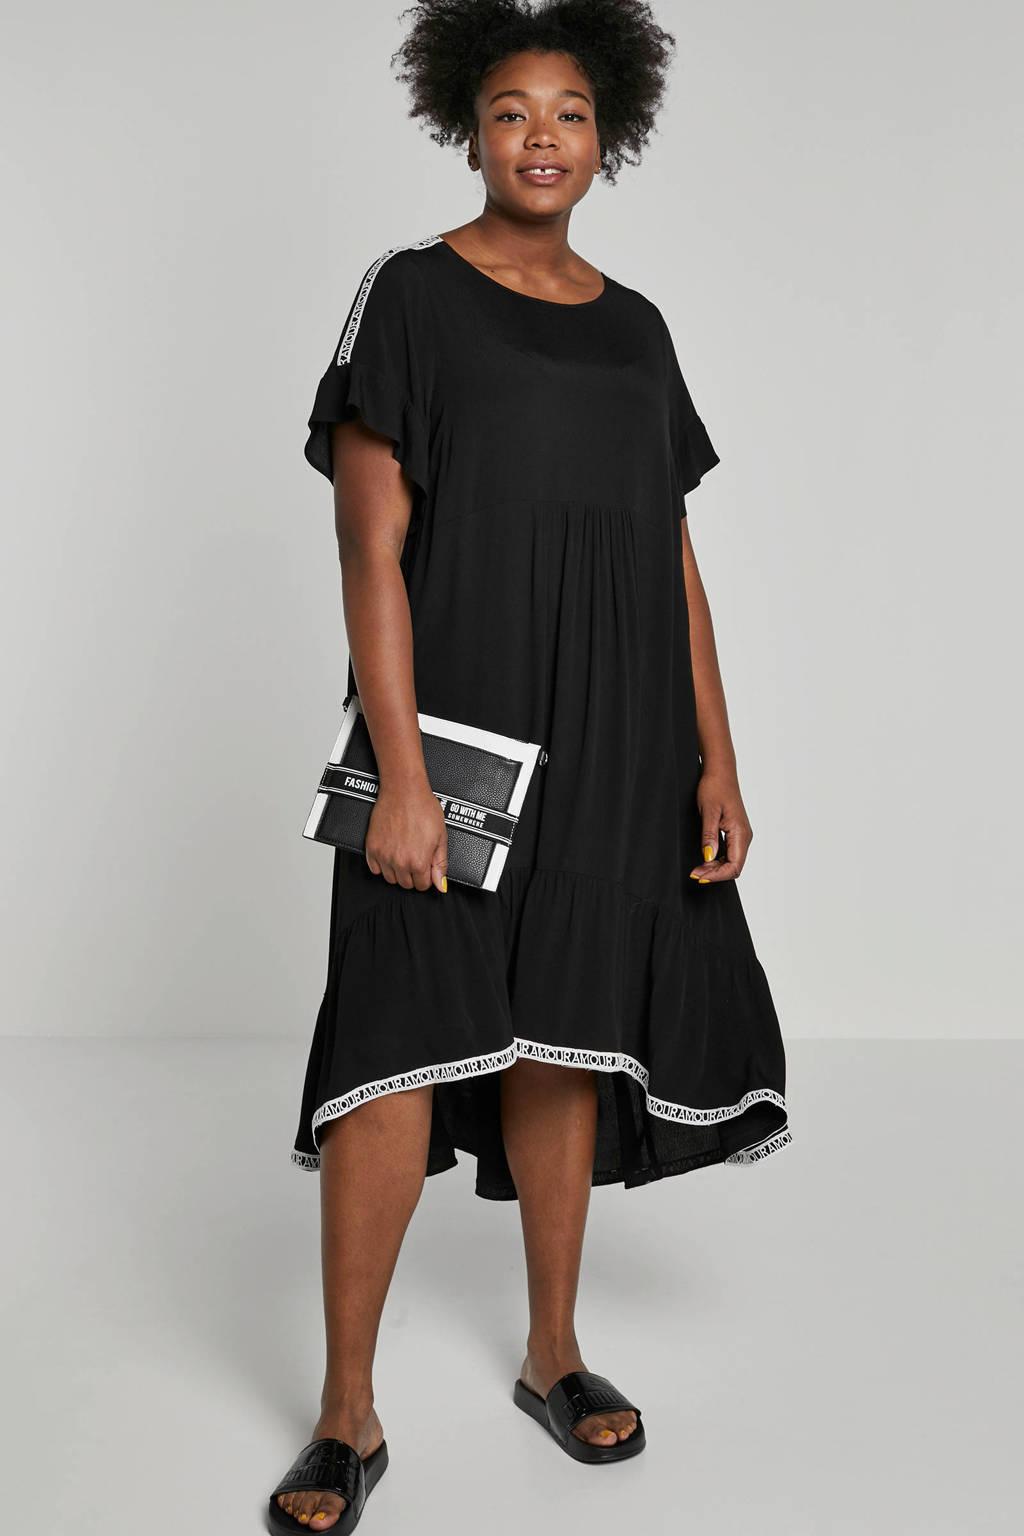 Mat Fashion jurk met contrast bies, Zwart/wit